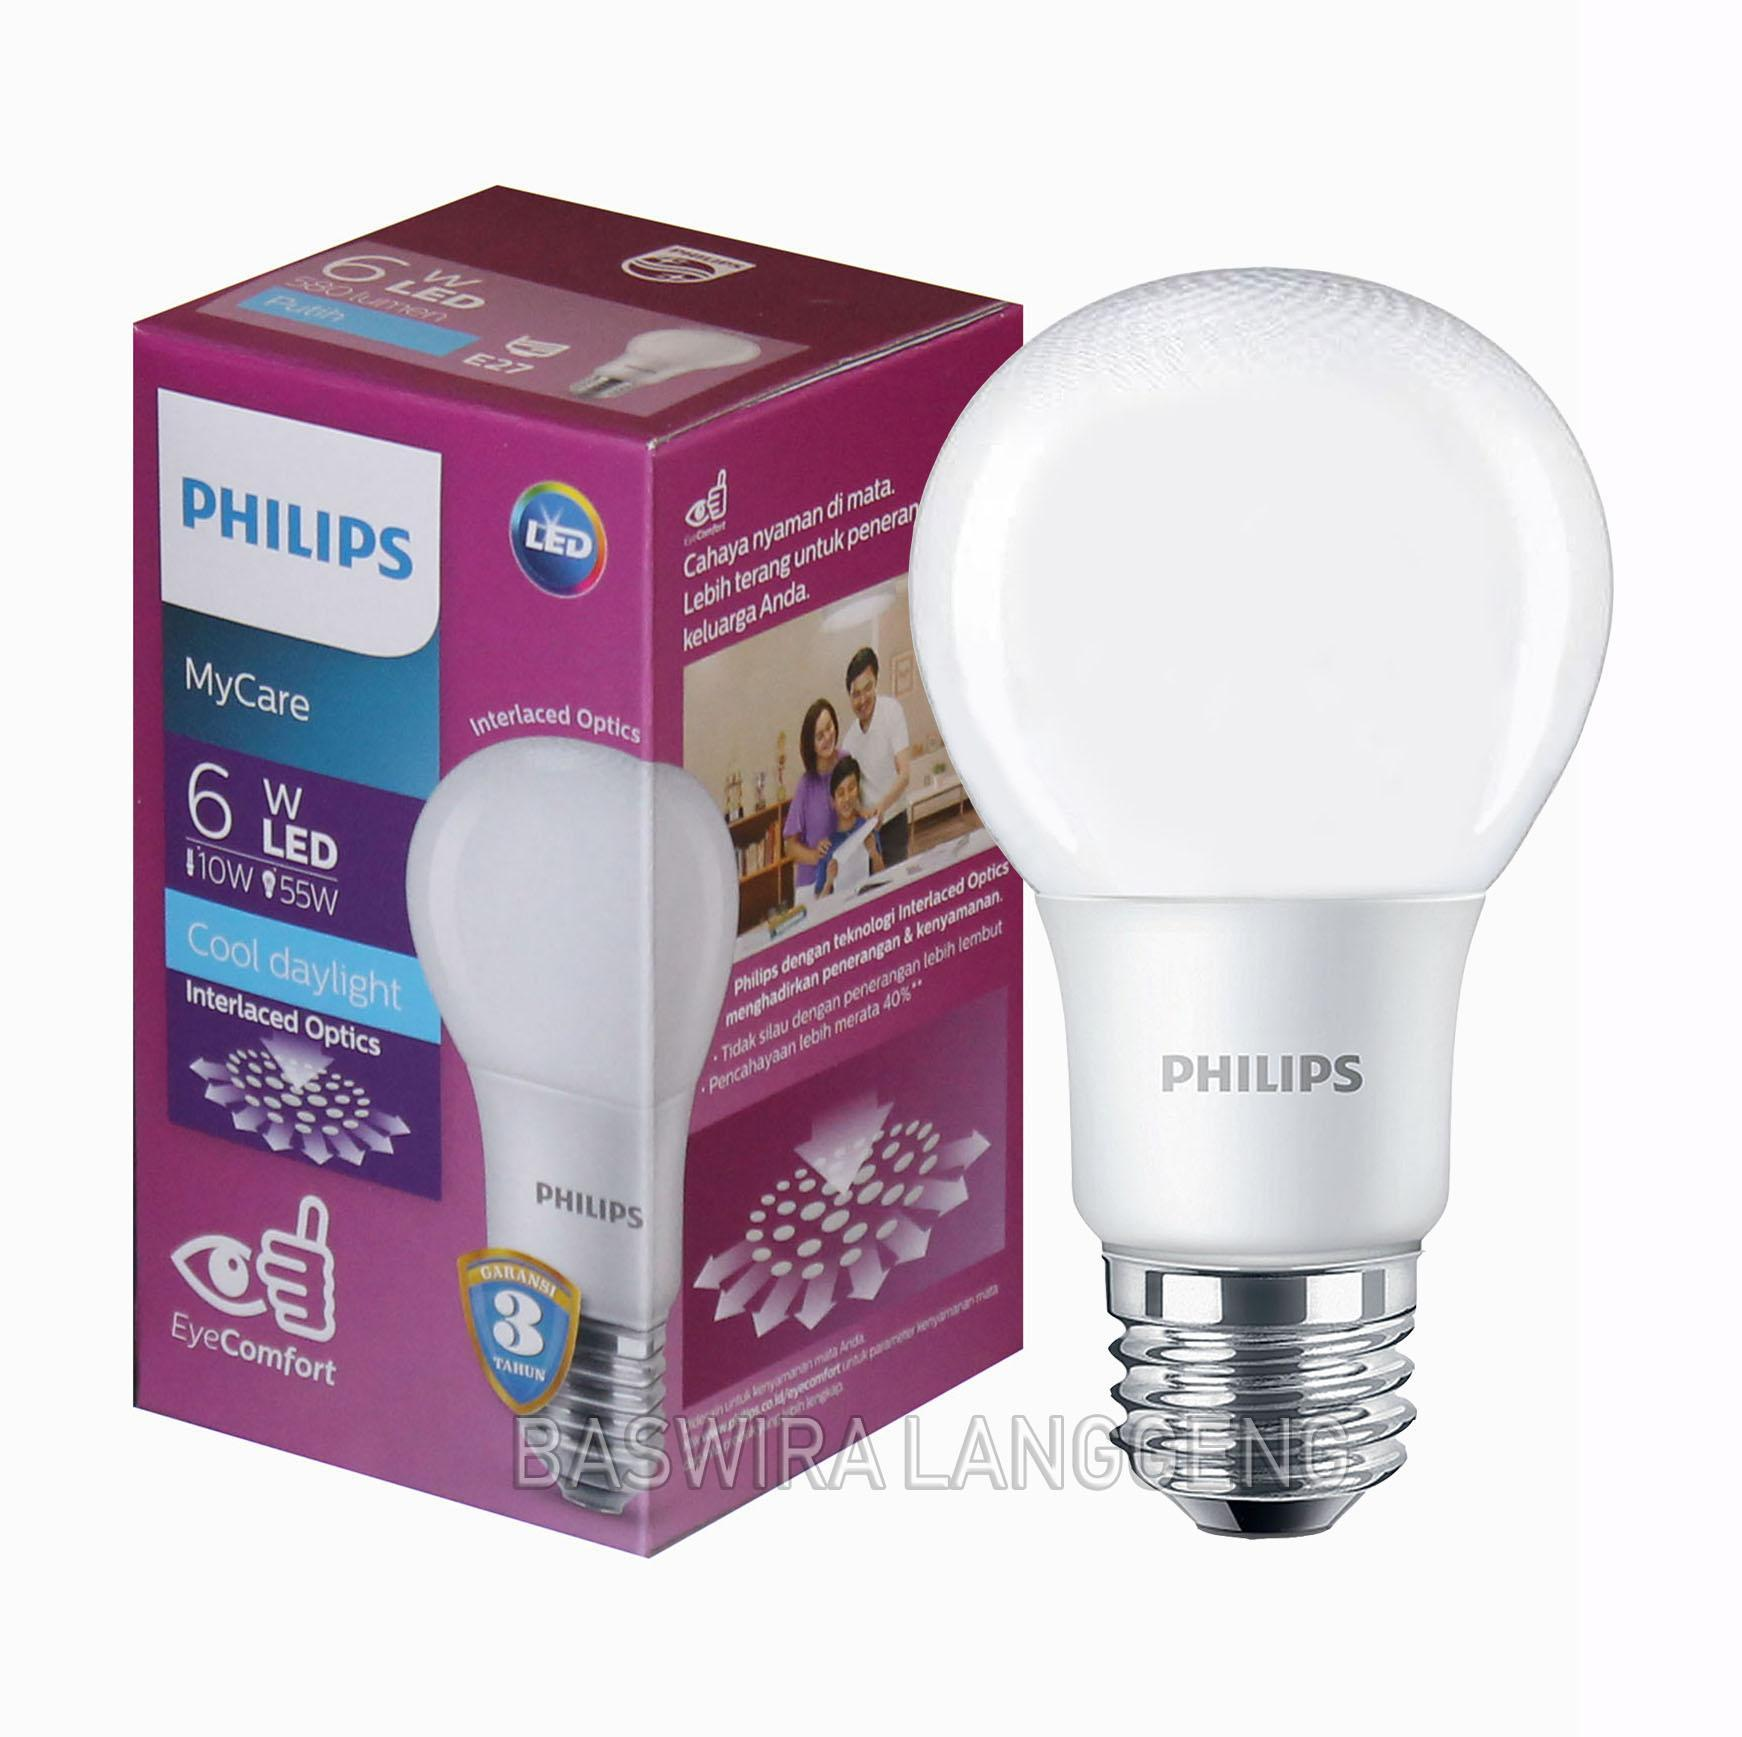 Philips Lampu LED 6 Watt MyCare CDL/Putih E27